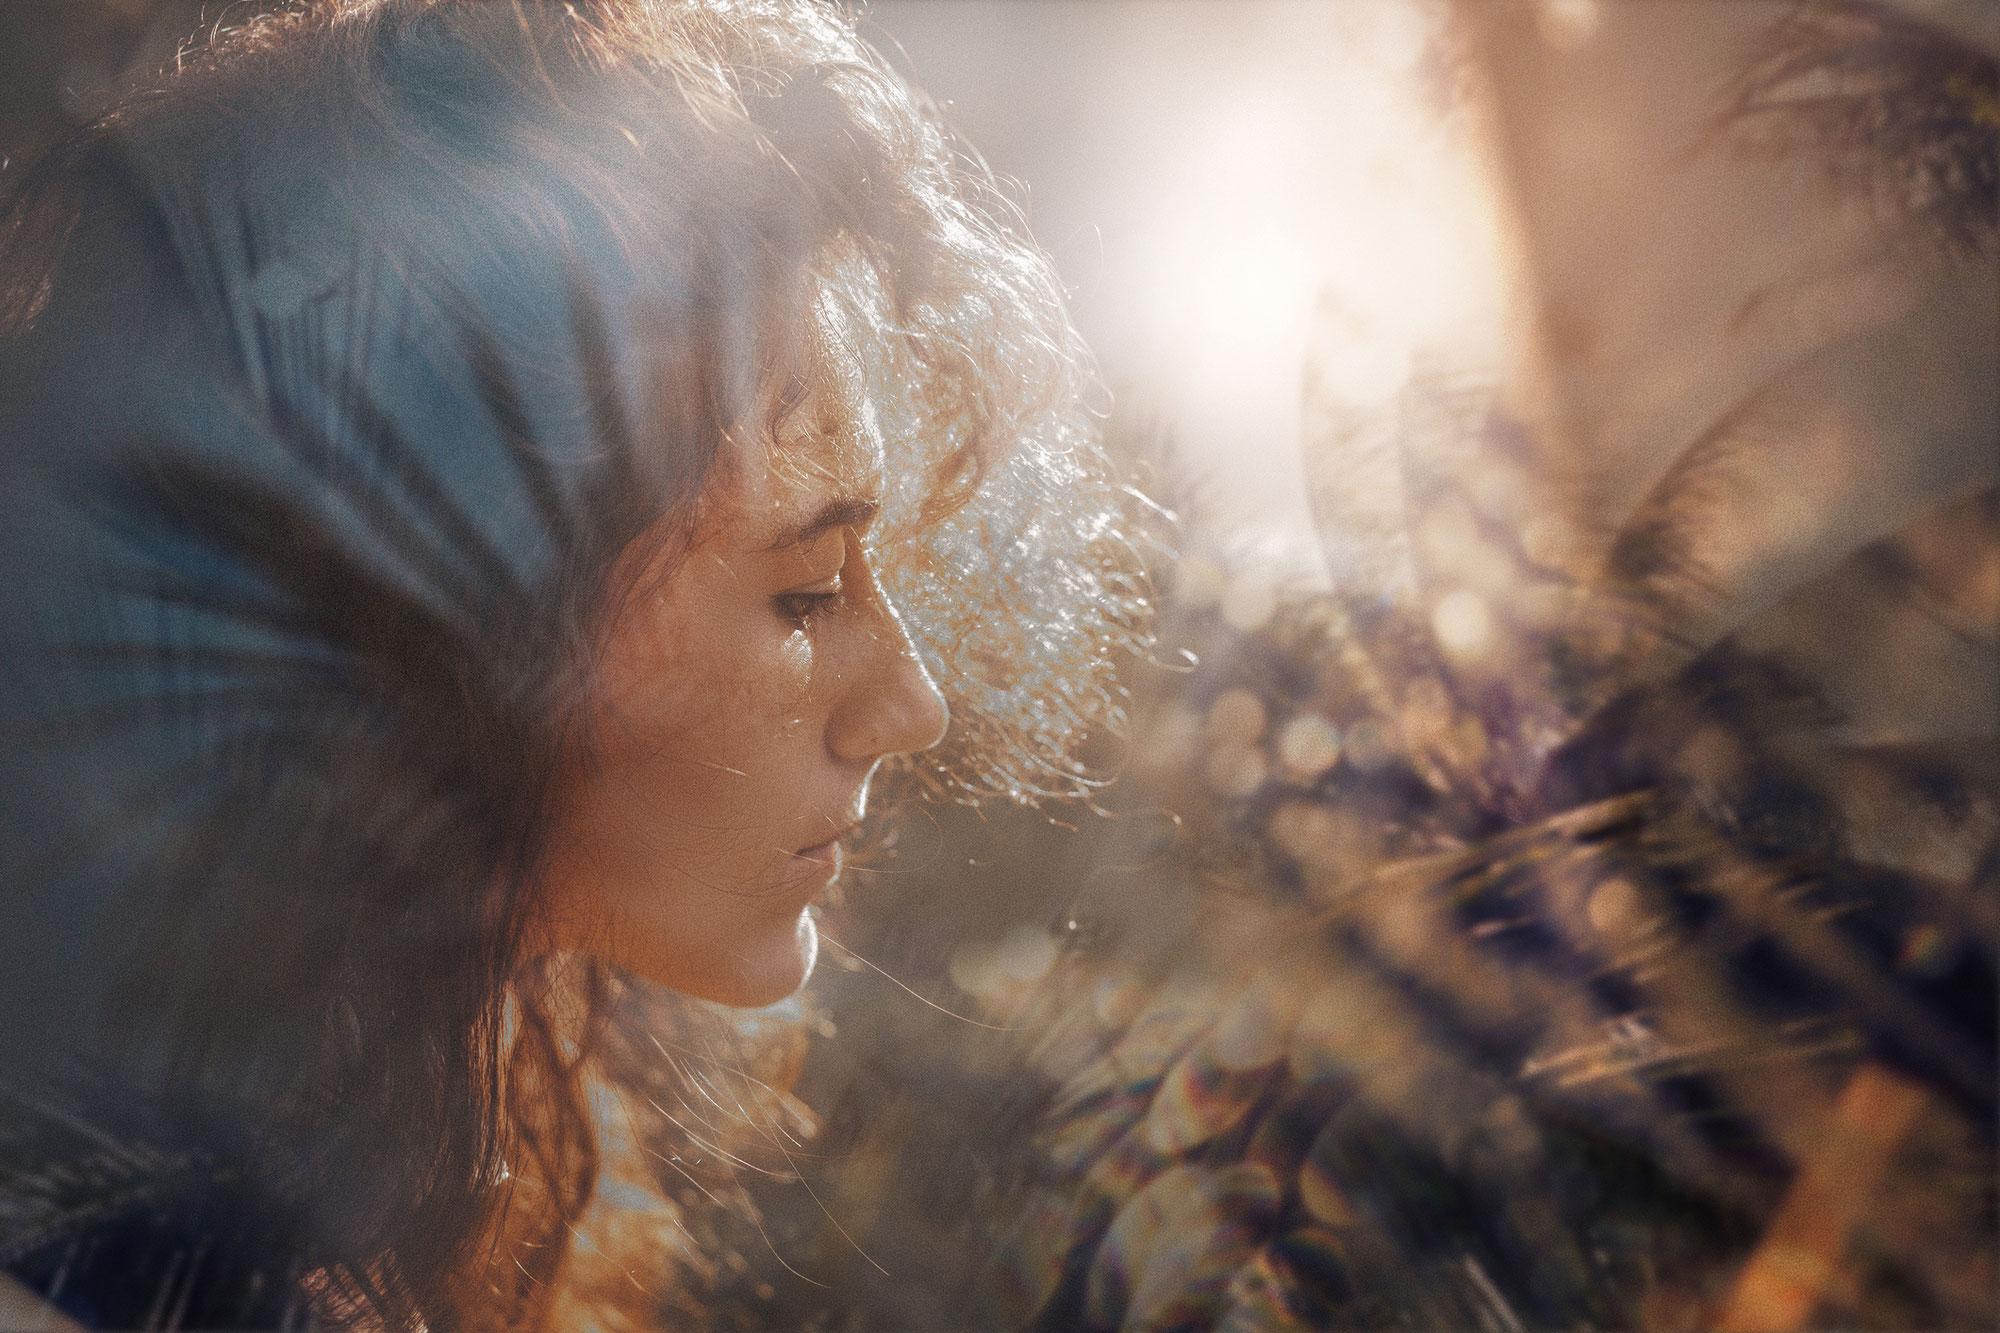 Engelen geduld en oervertrouwen gevraagd ♥ Mieke Vulink ♥ Lichtwerkers Nederland